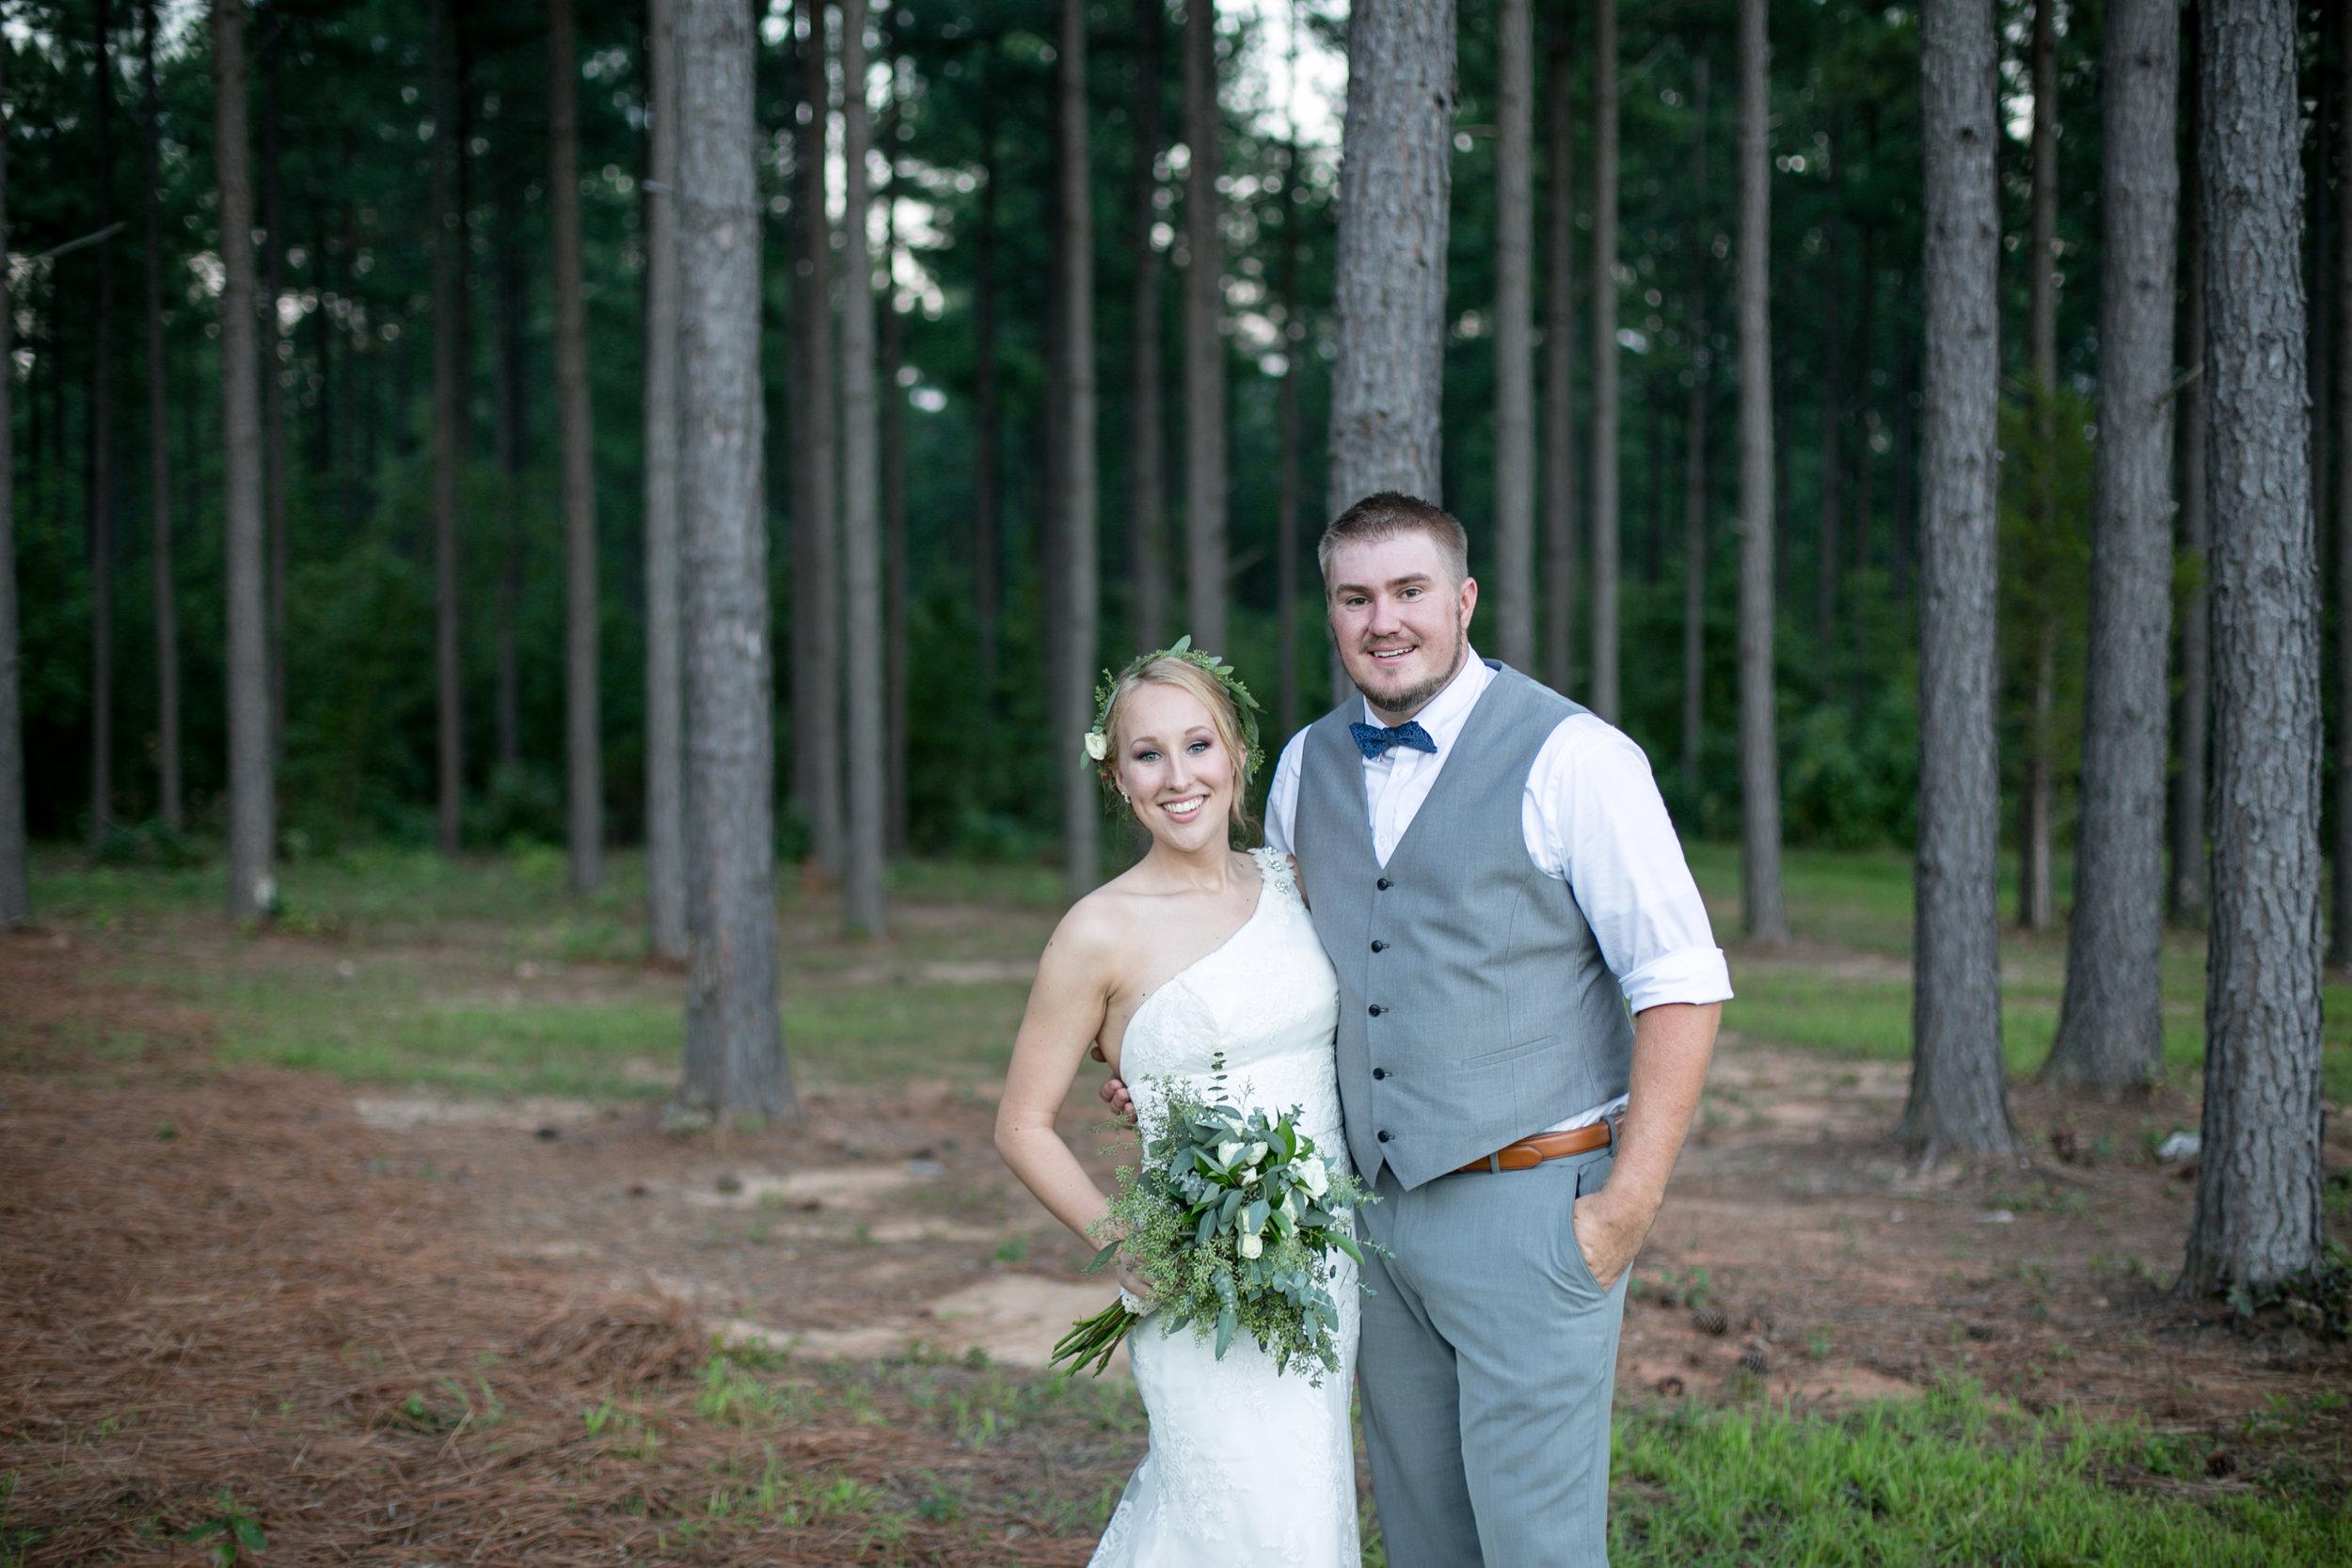 Luke_Sarah_Calaway_Wedding_12Aug17_1020.jpg